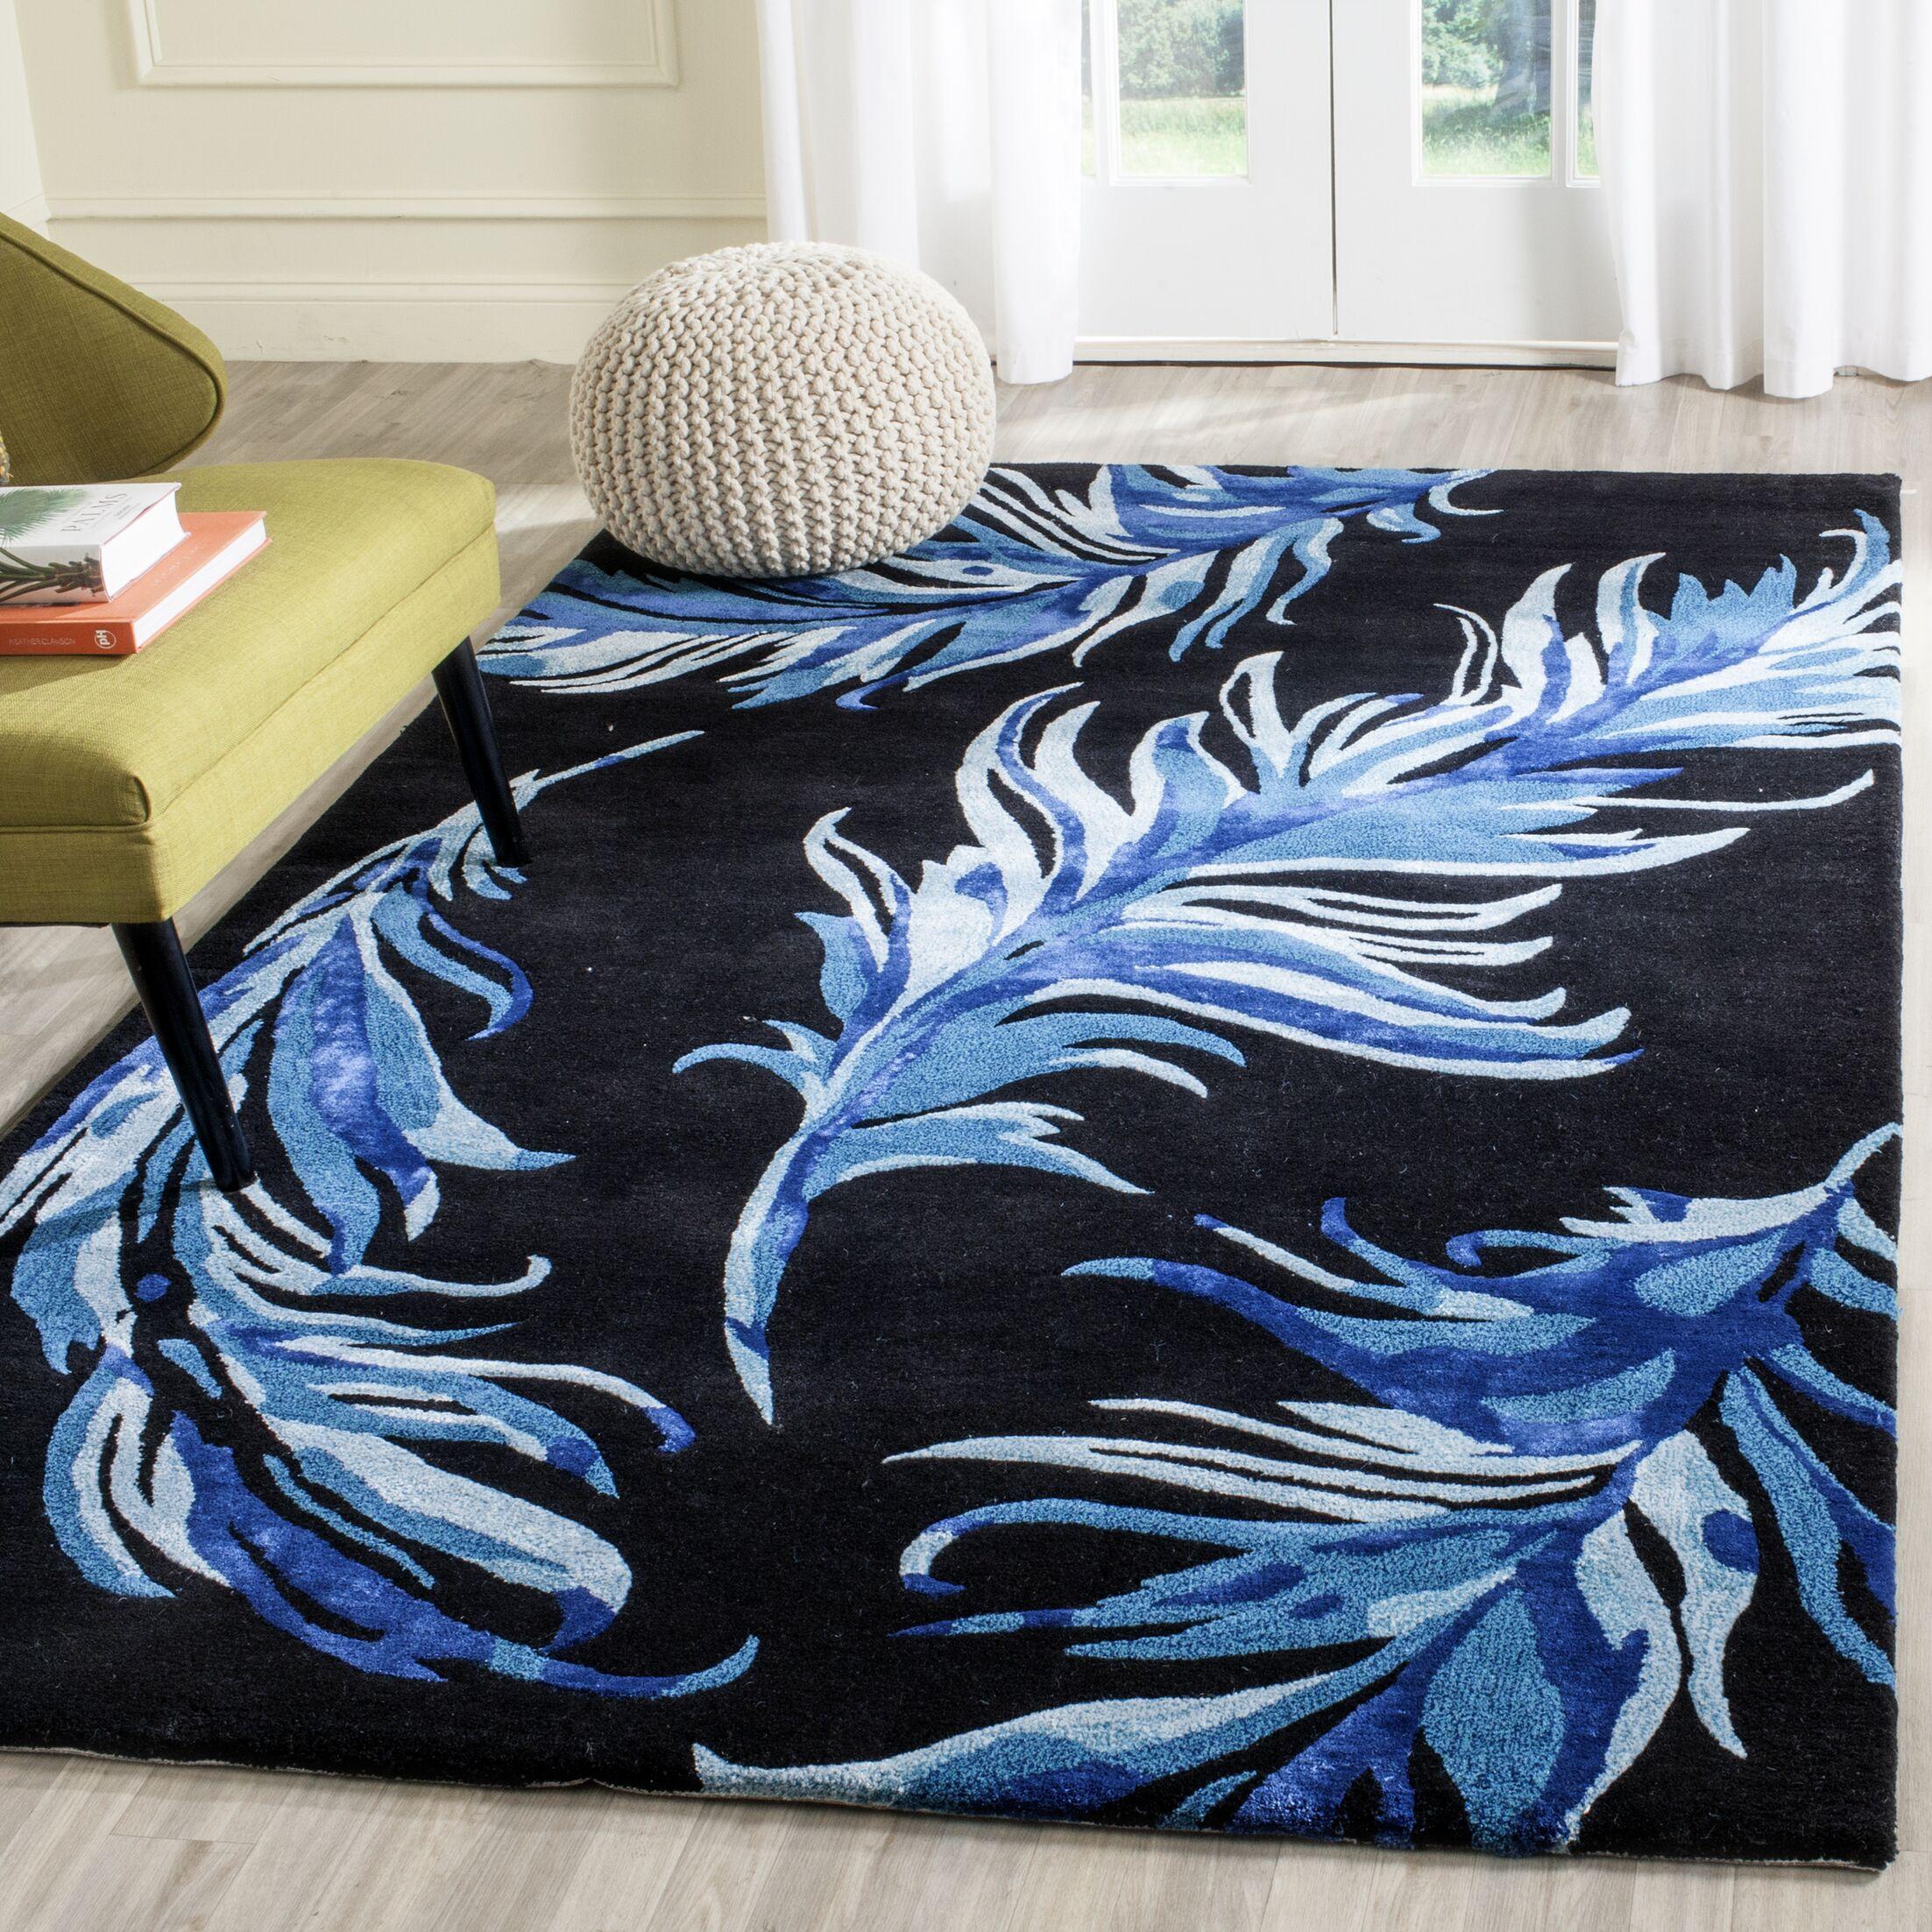 Leeds Black/Blue Area Rug Rug Size: Rectangle 4' x 6'